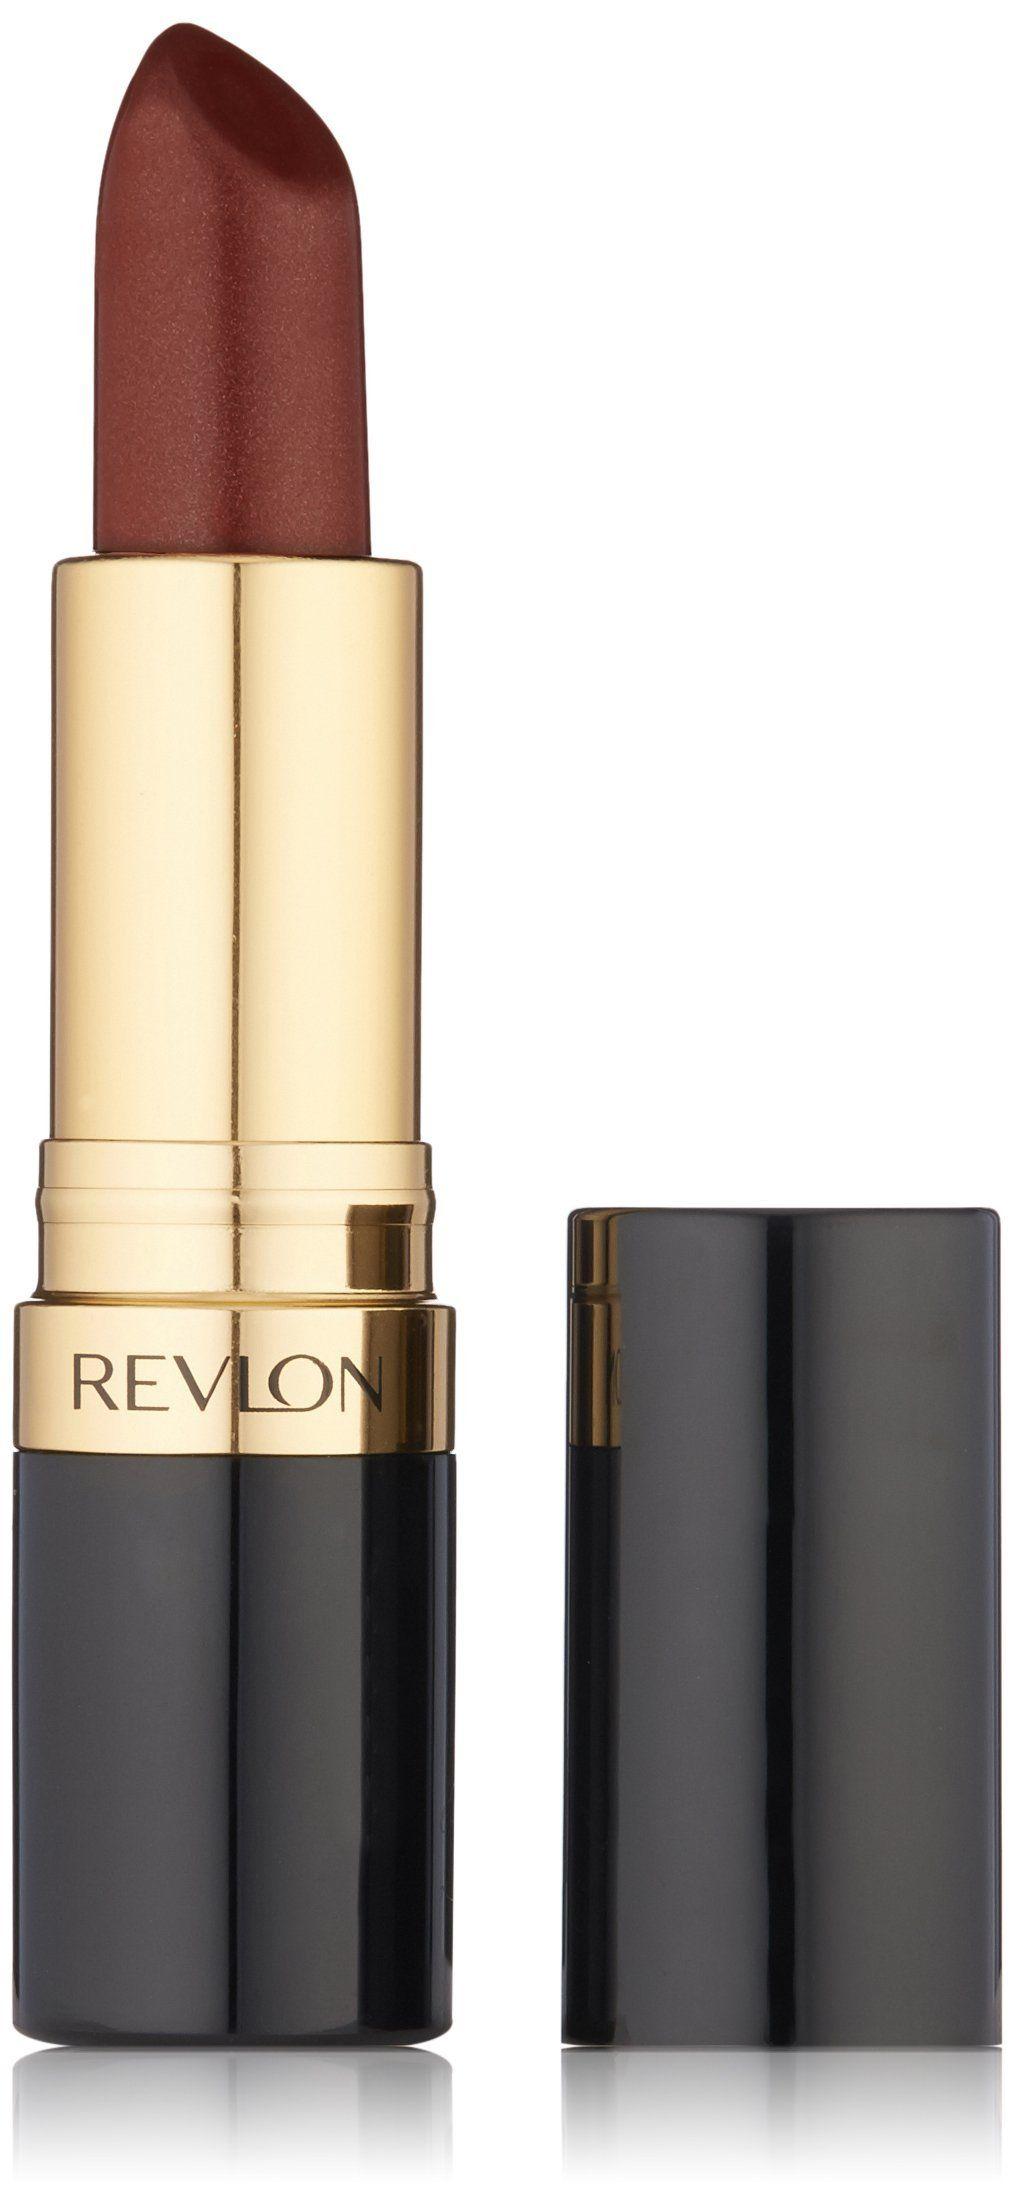 Revlon Super Lustrous Lipstick Pearl, Coffee Bean 300, 015 Ounce